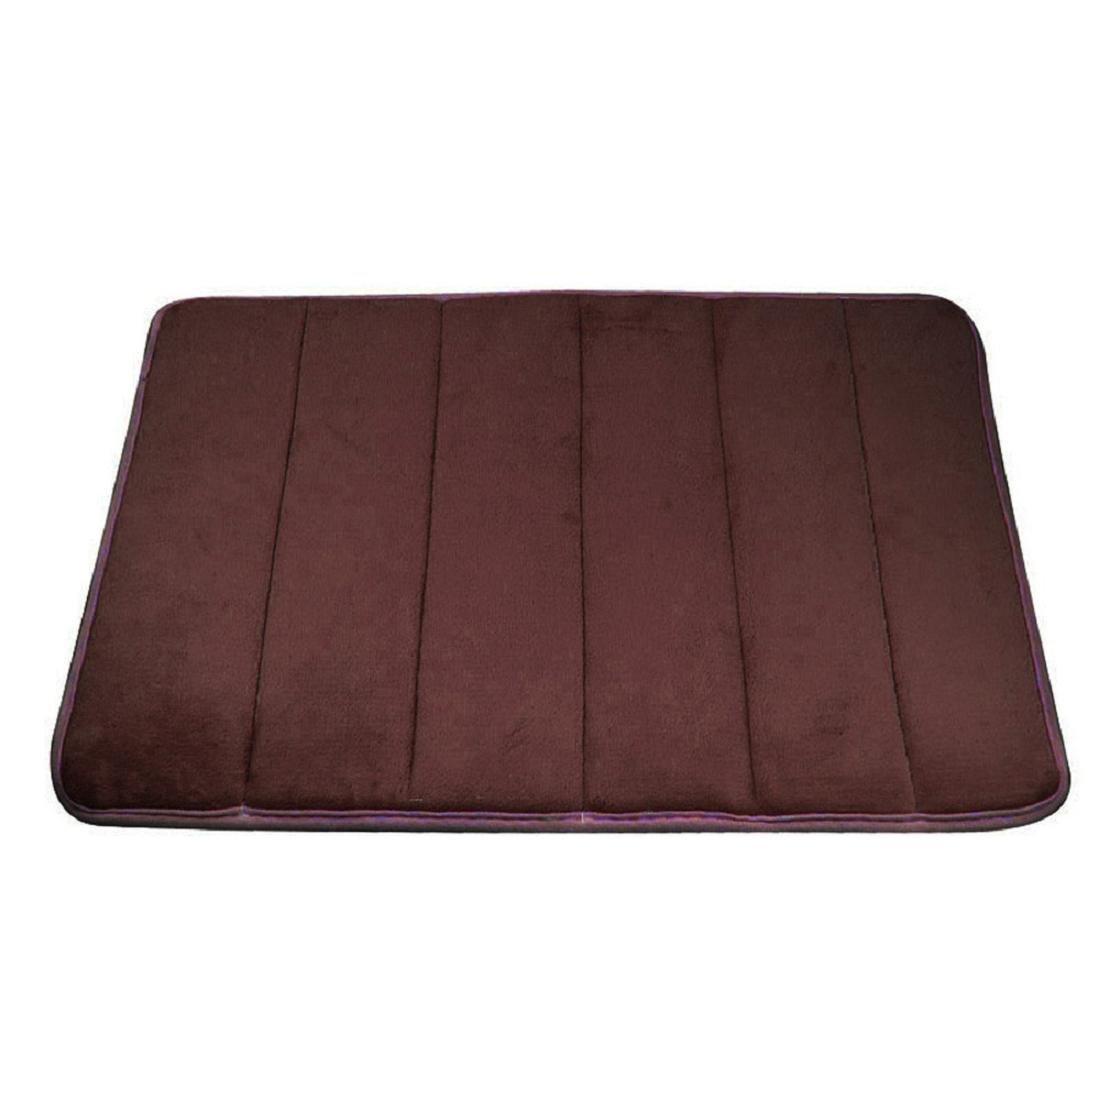 Coromose Rugs Vertical Stripes Memory Foam Bath Mat Carpet Floor Mats (Coffee)